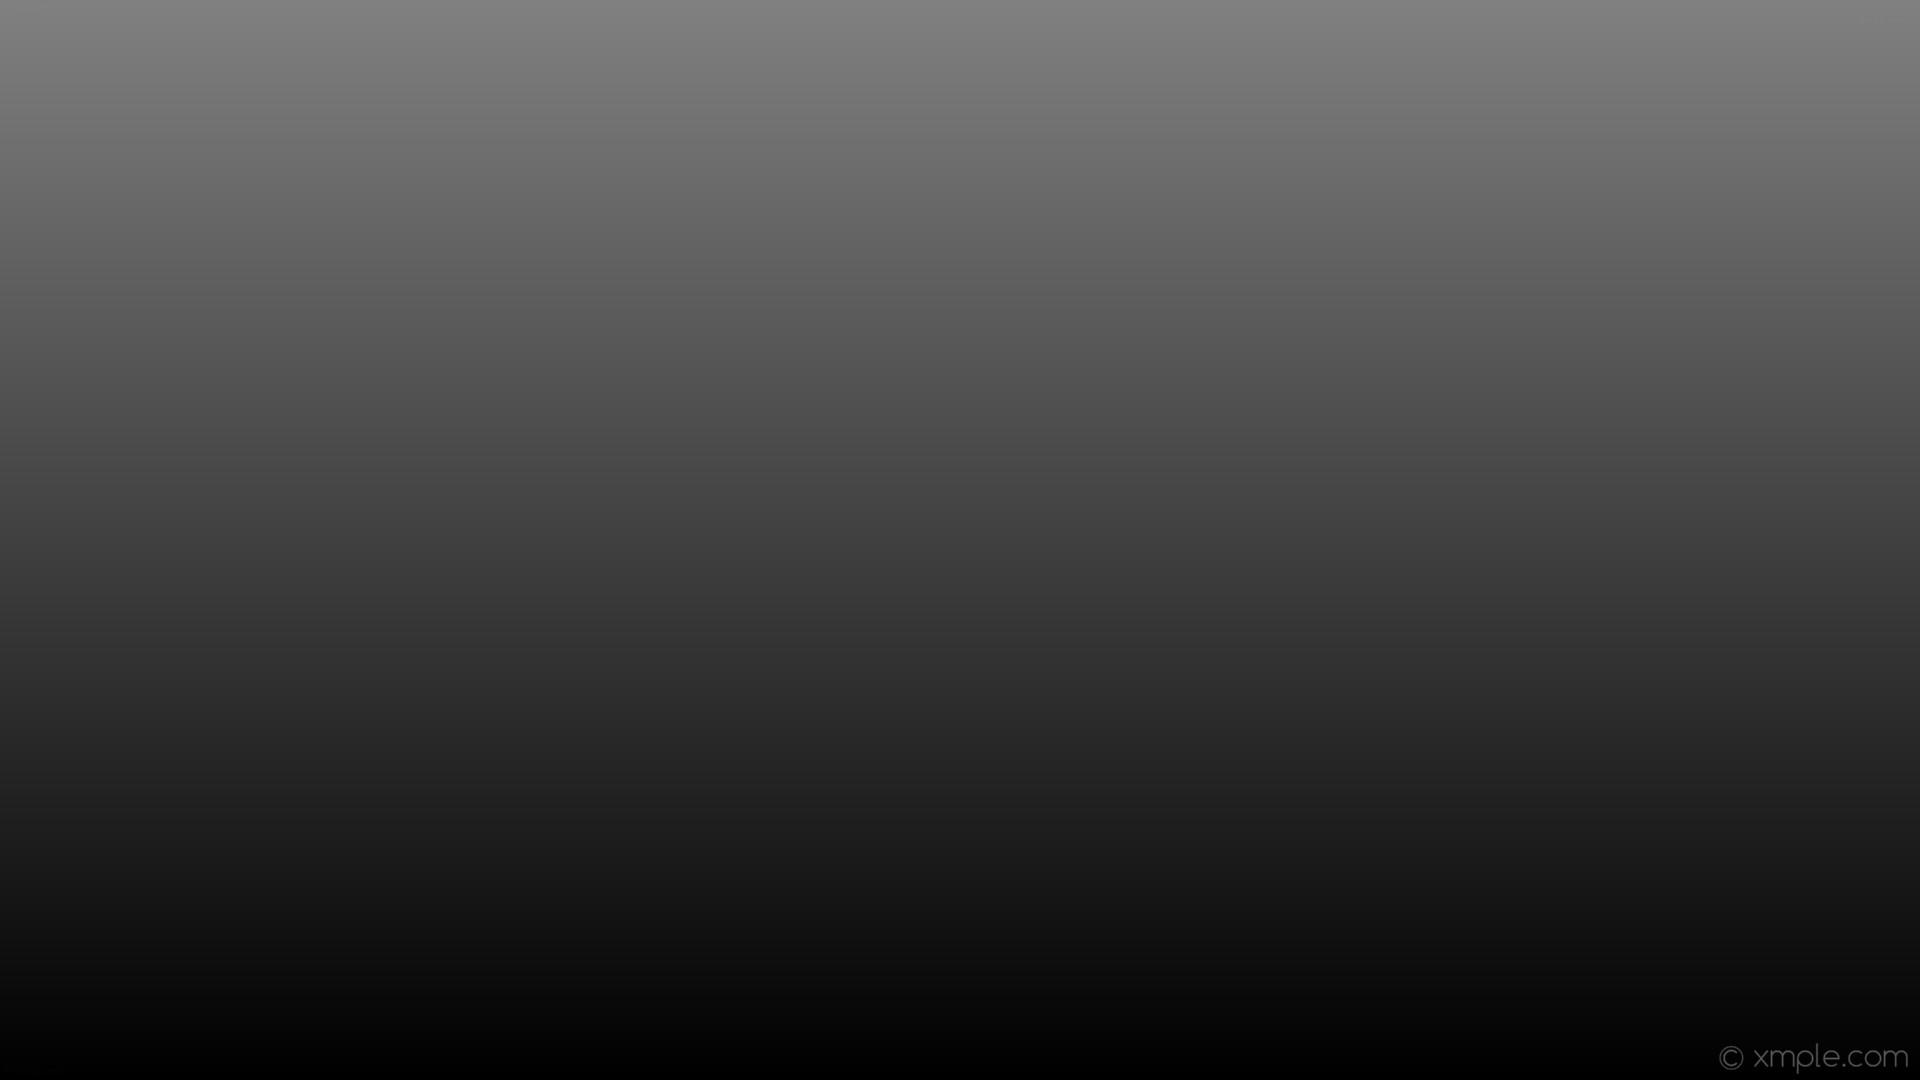 wallpaper black grey gradient linear gray #000000 #808080 270°